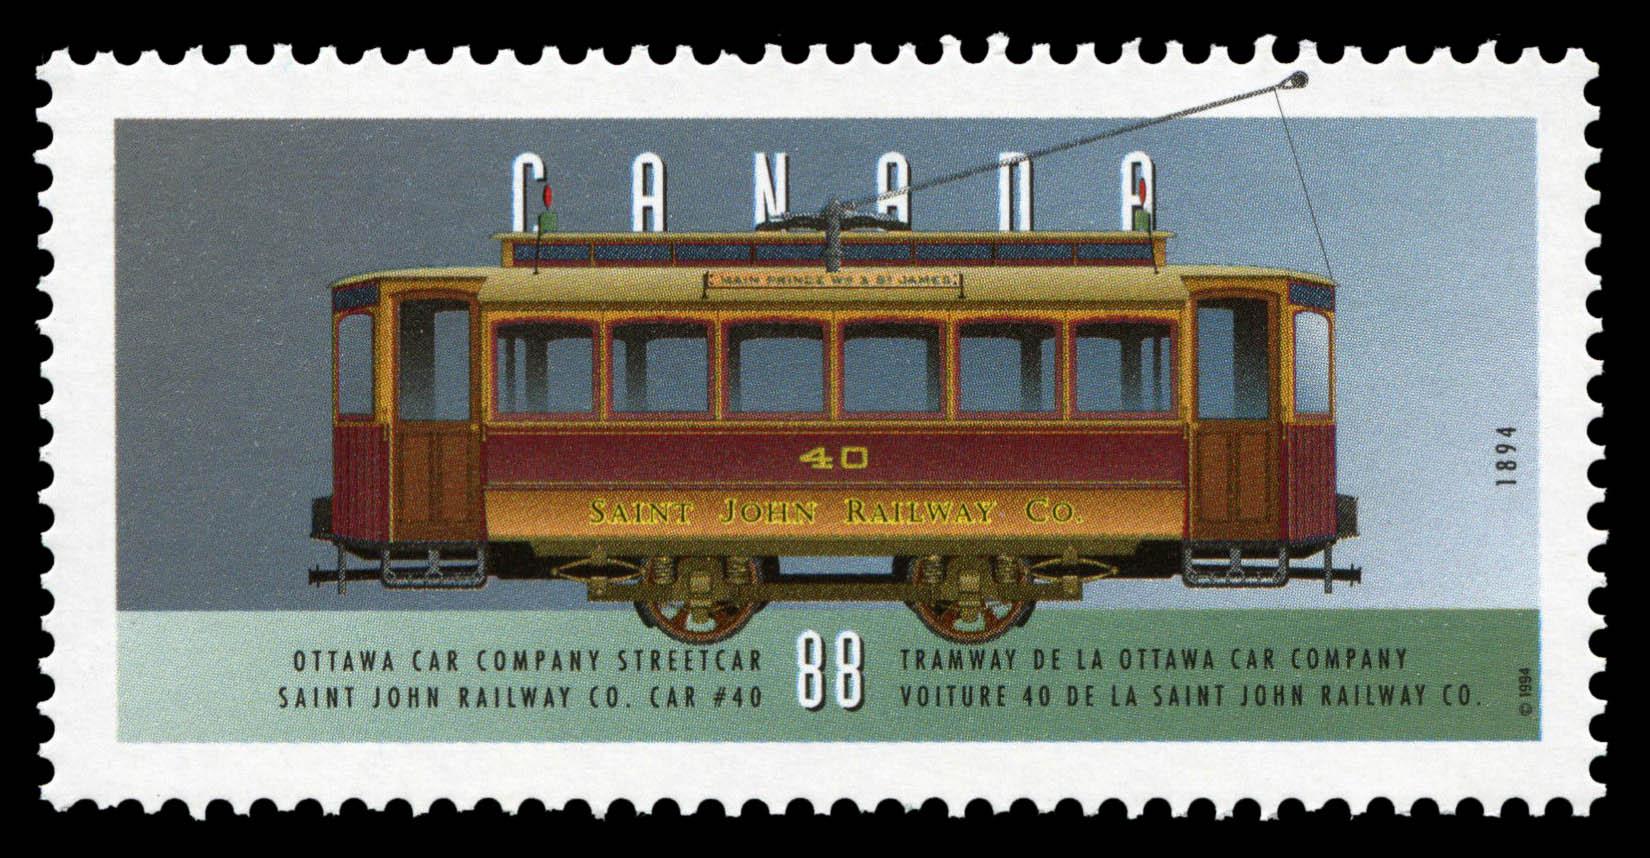 Ottawa Car Company Streetcar, 1894, Saint John Railway Co. Car #40 Canada Postage Stamp | Historic Land Vehicles, Public Service Vehicles